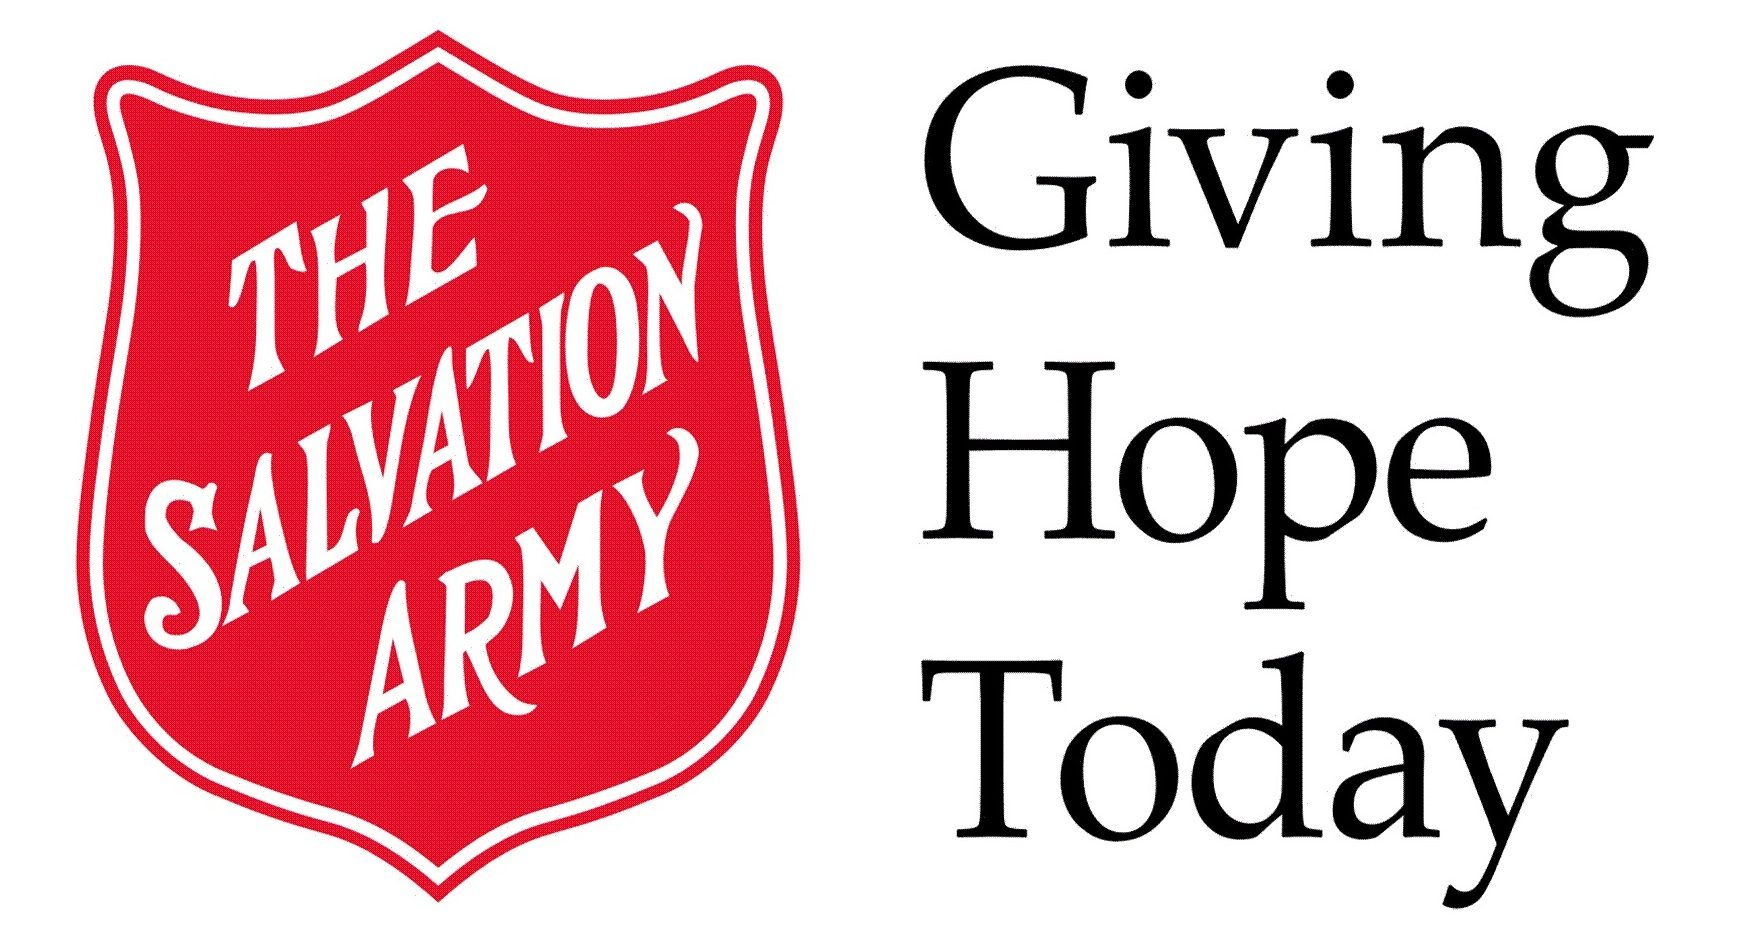 Wiarton Salvation Army